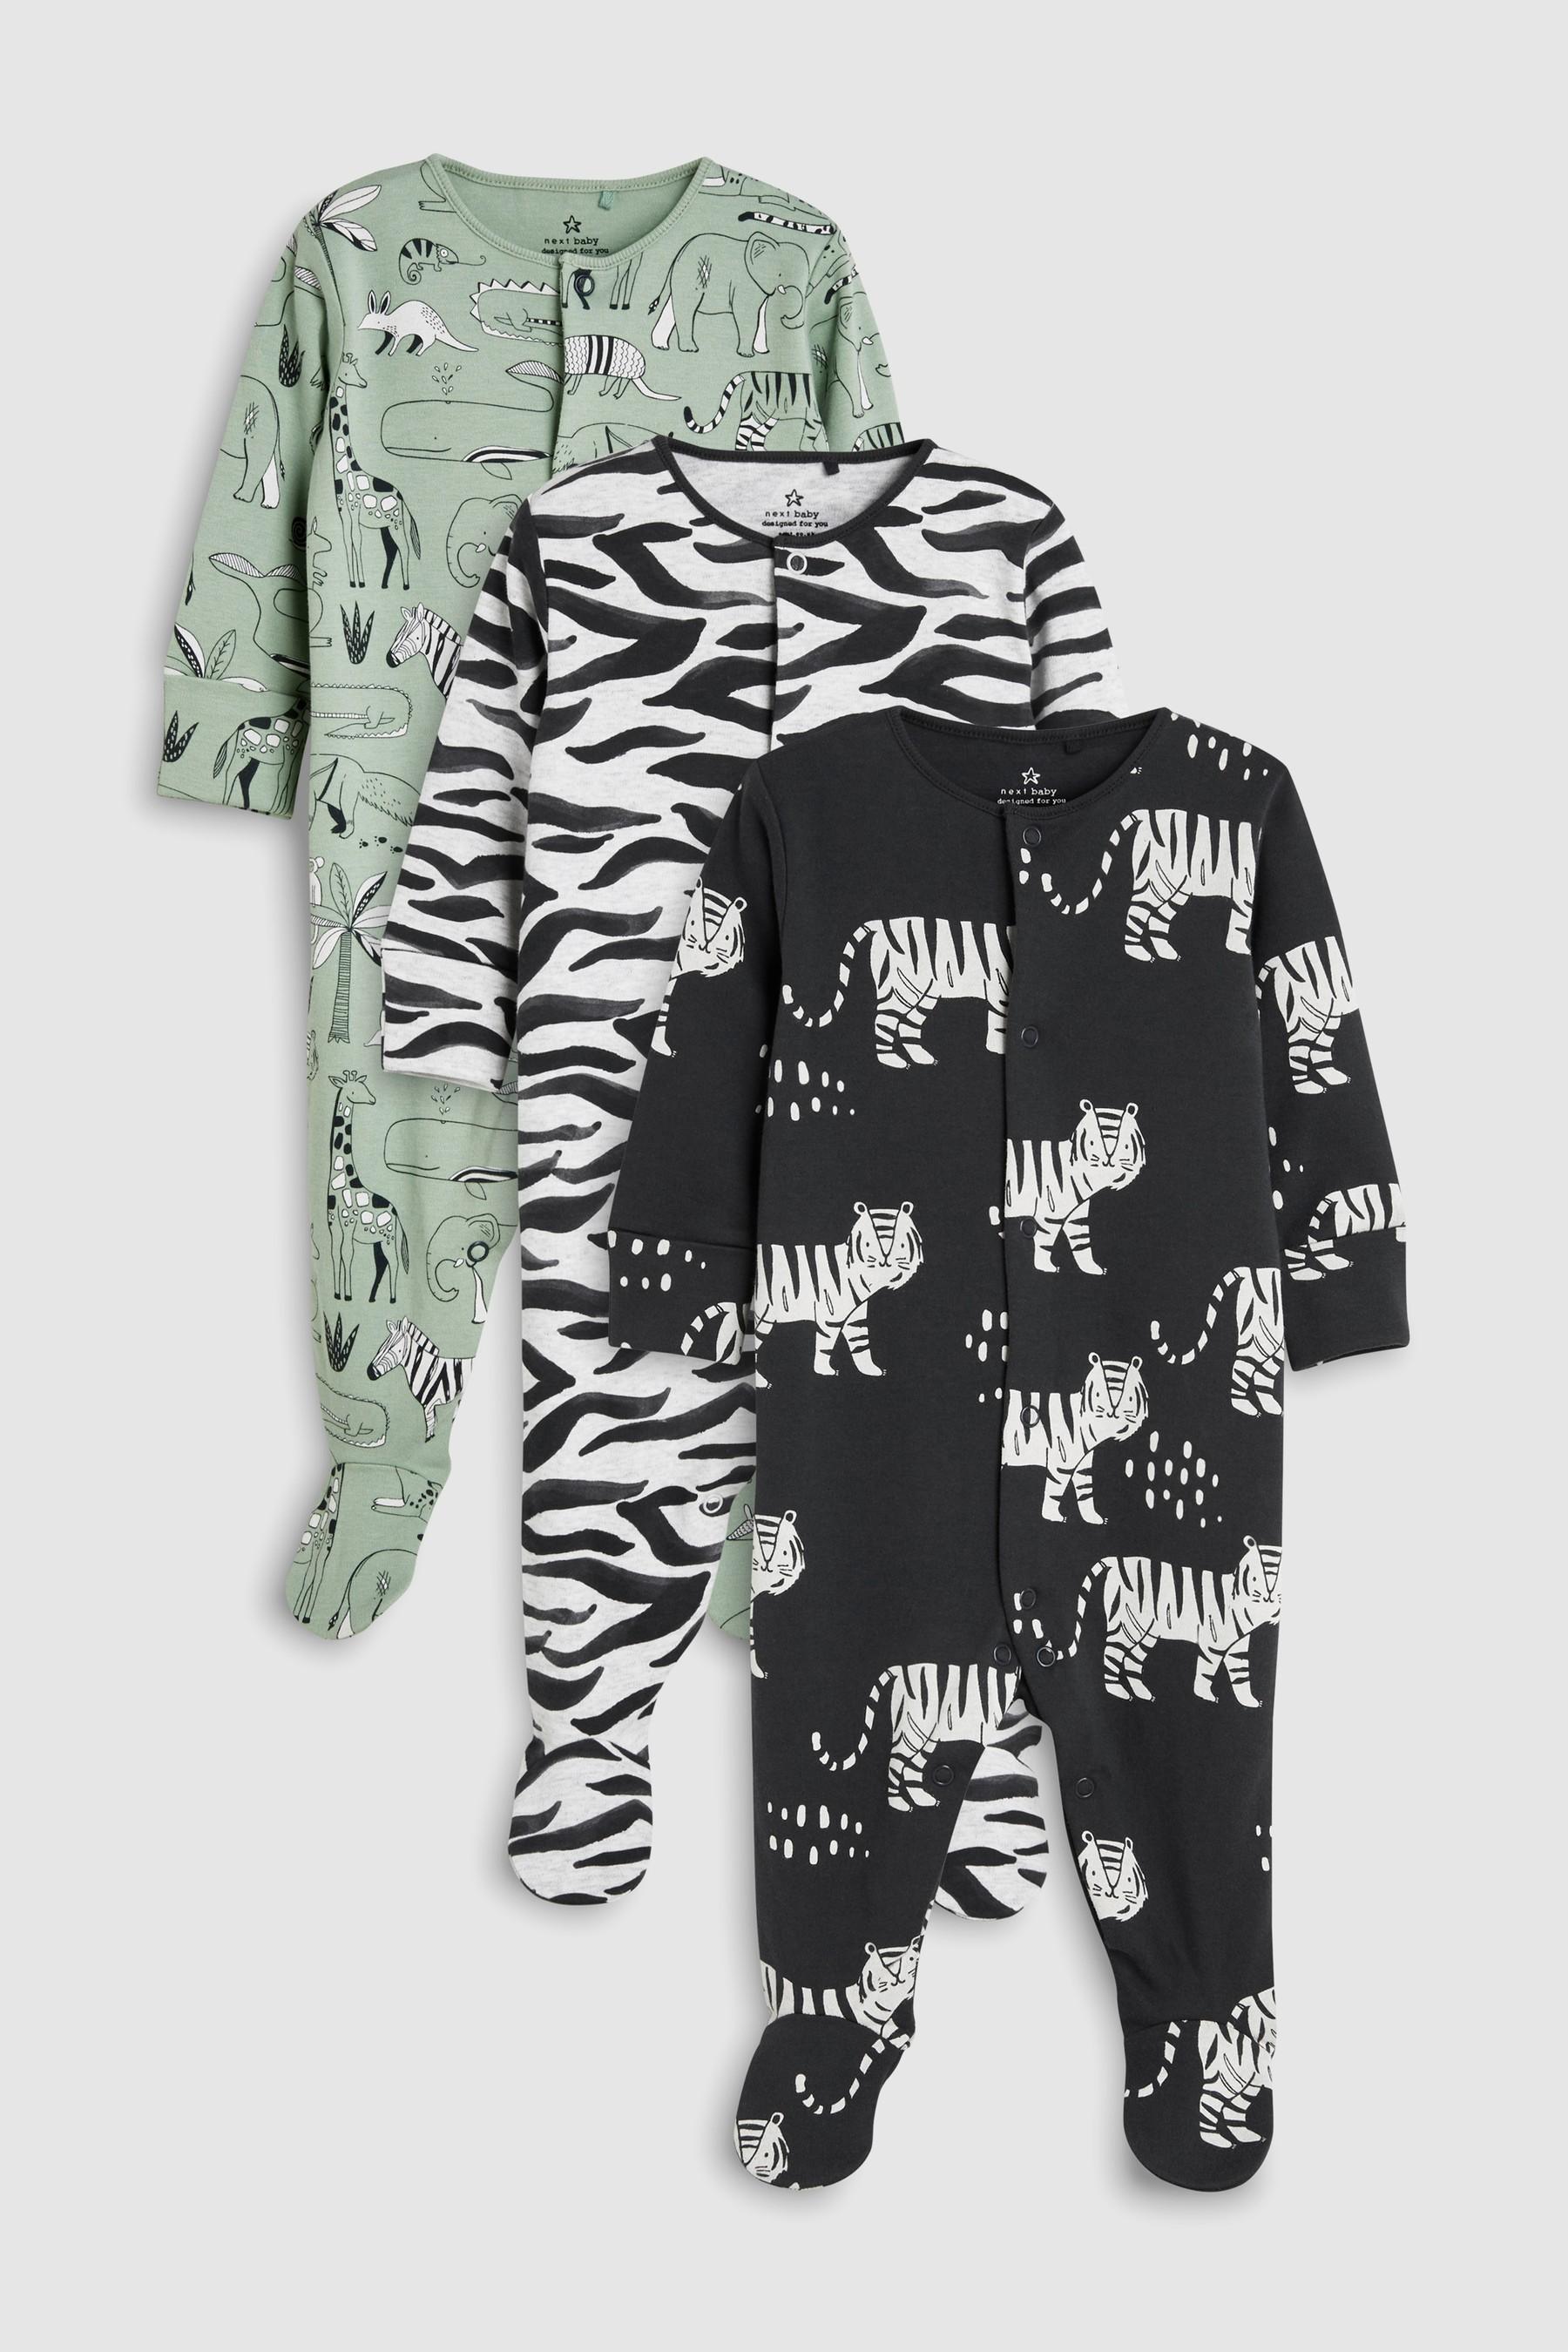 9e2ea0851 Animal Character Print Sleepsuits Three Pack (0mths-2yrs)